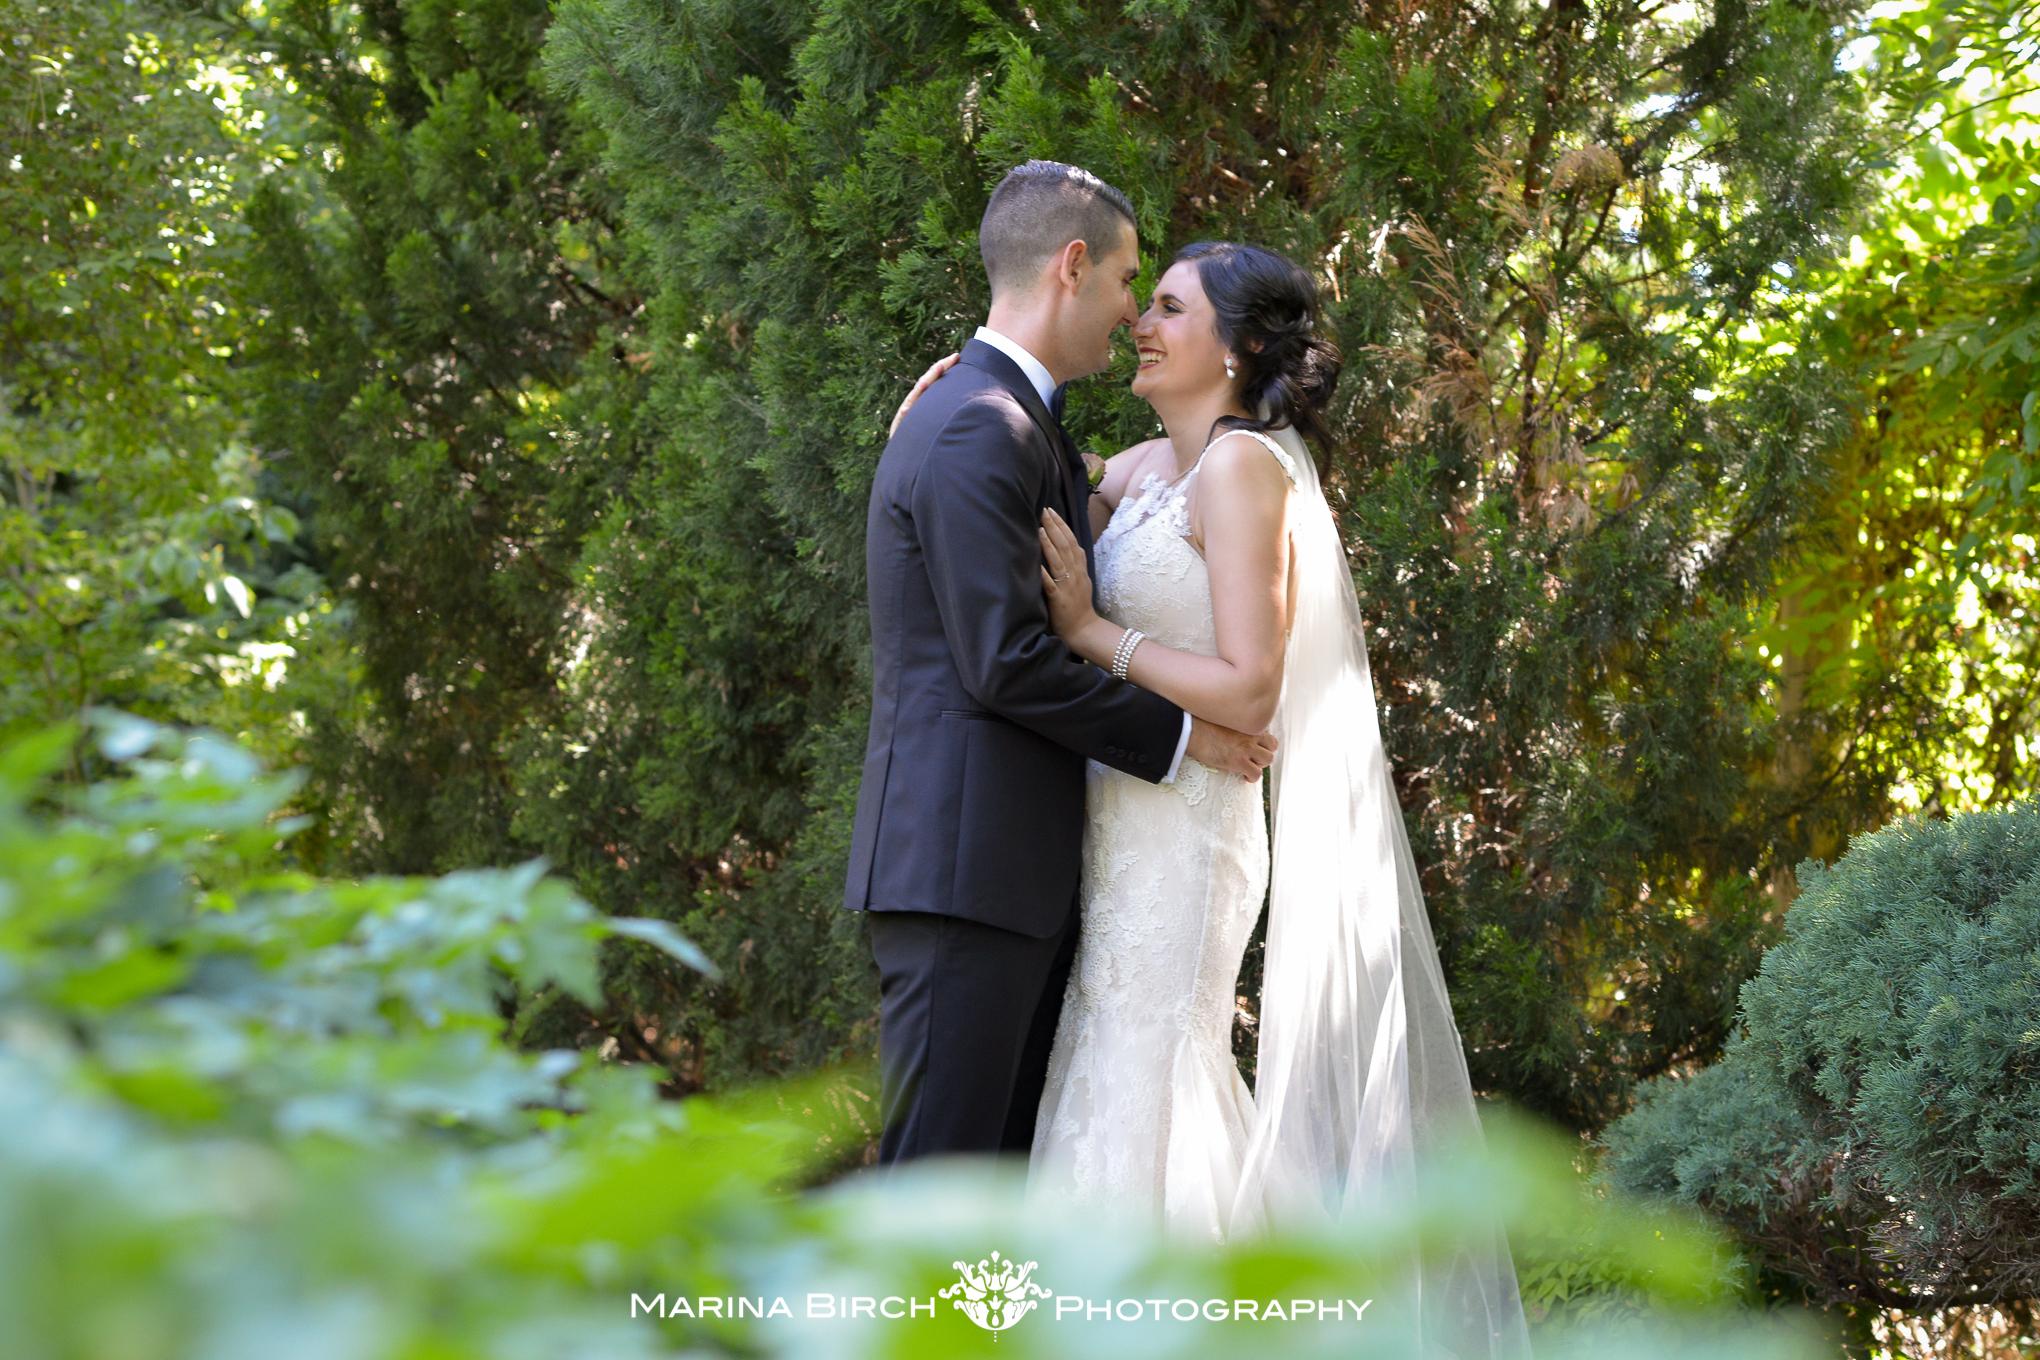 MBP.Lava wedding -15.jpg